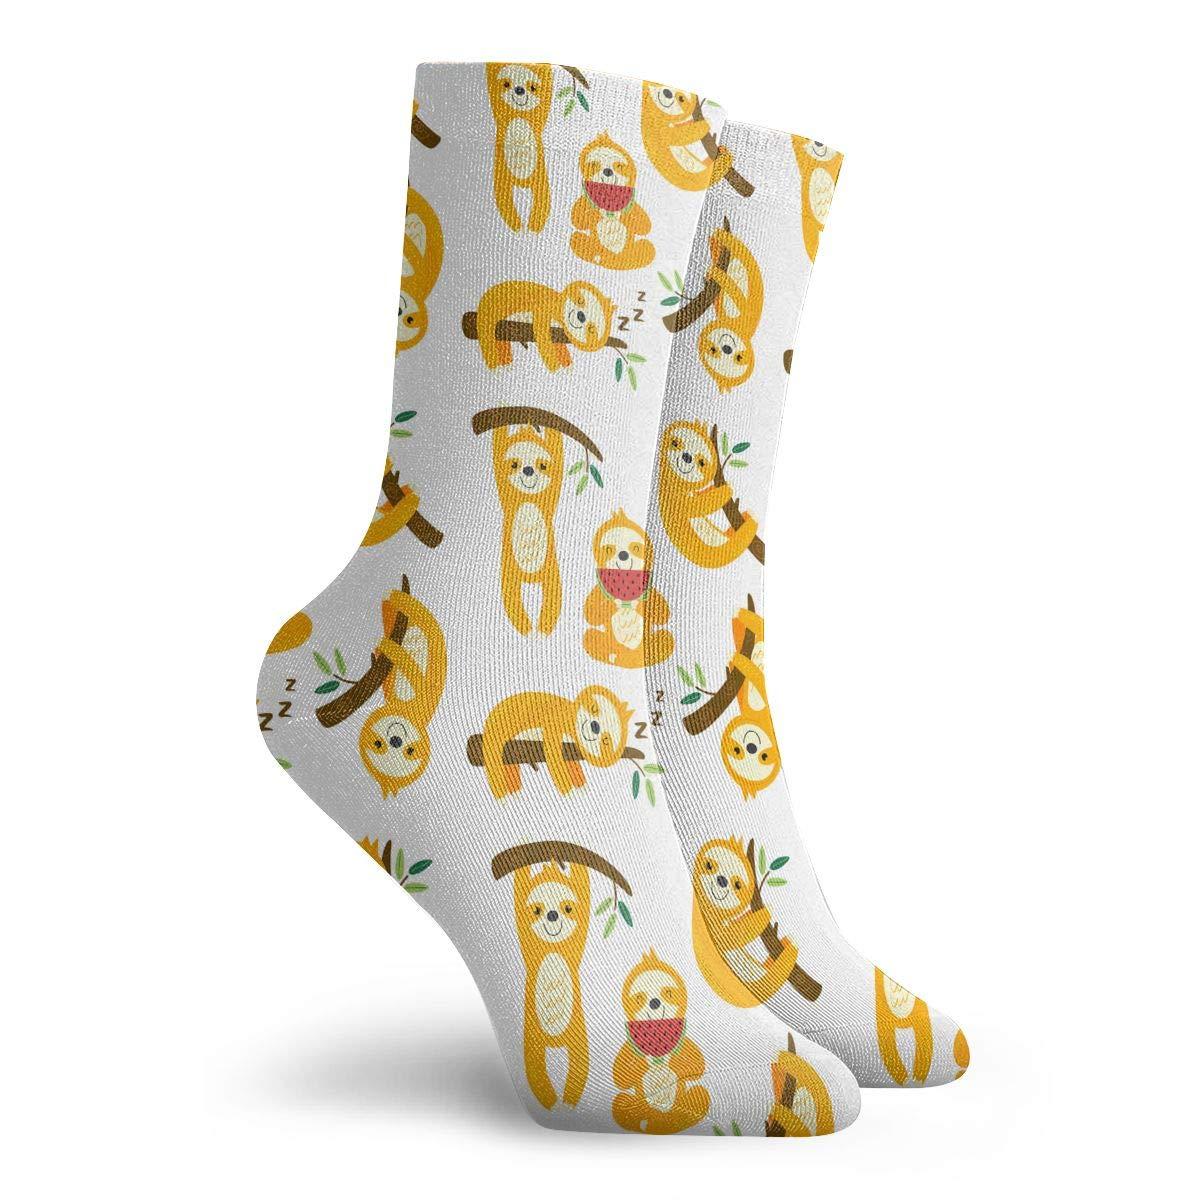 Unisex Funny Sloths Athletic Quarter Ankle Print Breathable Hiking Running Socks